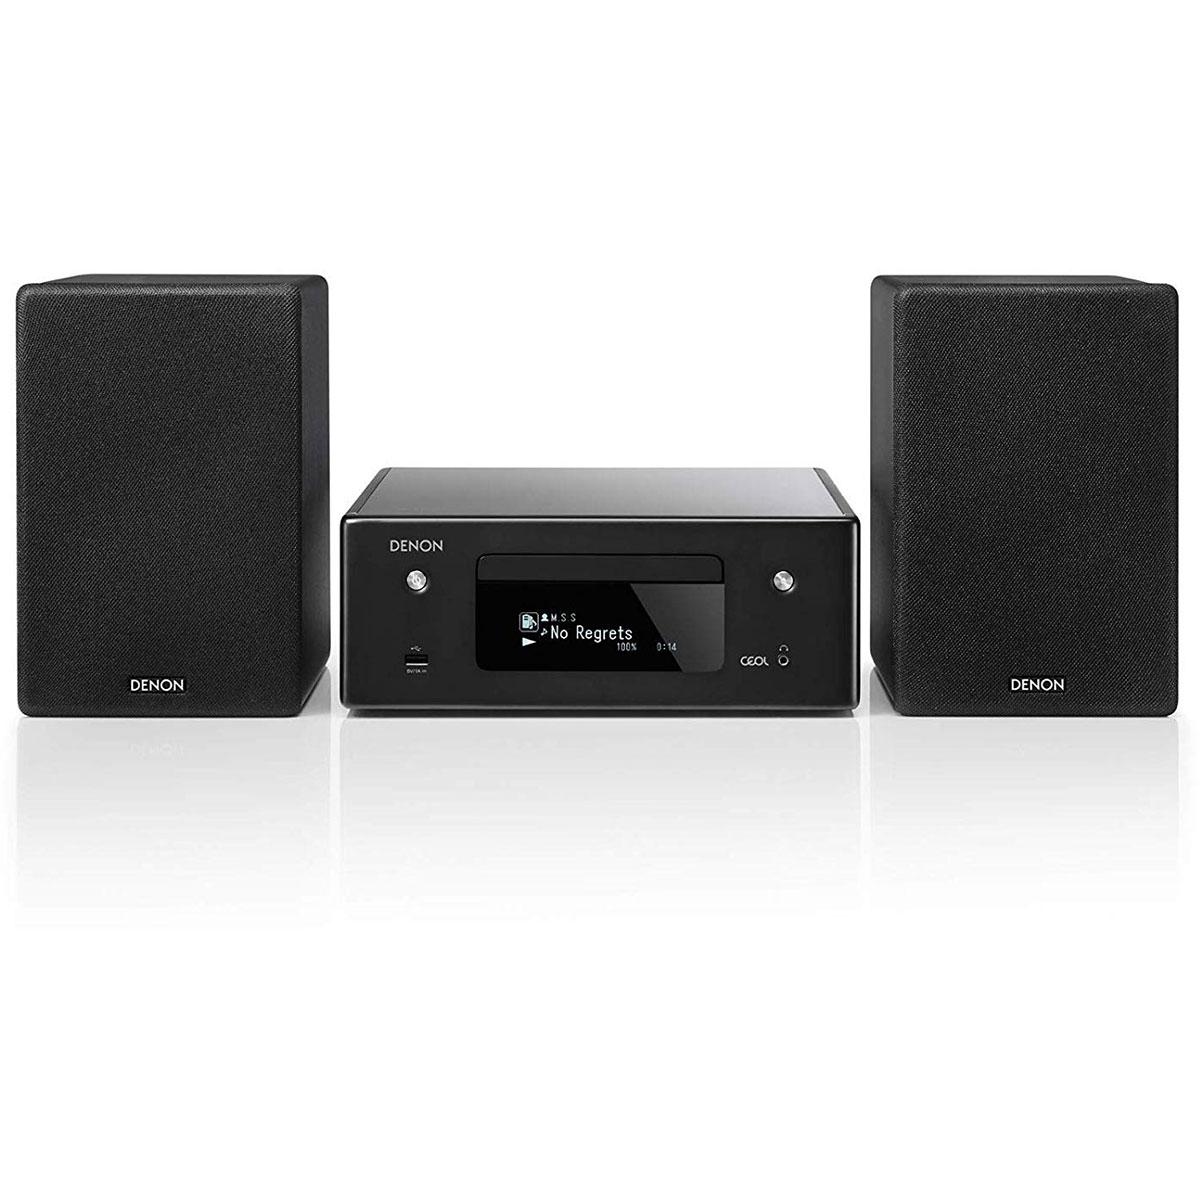 Chaîne Hifi Denon CEOL N10 Noir Micro-chaîne CD MP3 USB réseau Wi-Fi Bluetooth avec contrôle iOS, Android et Amazon Alexa